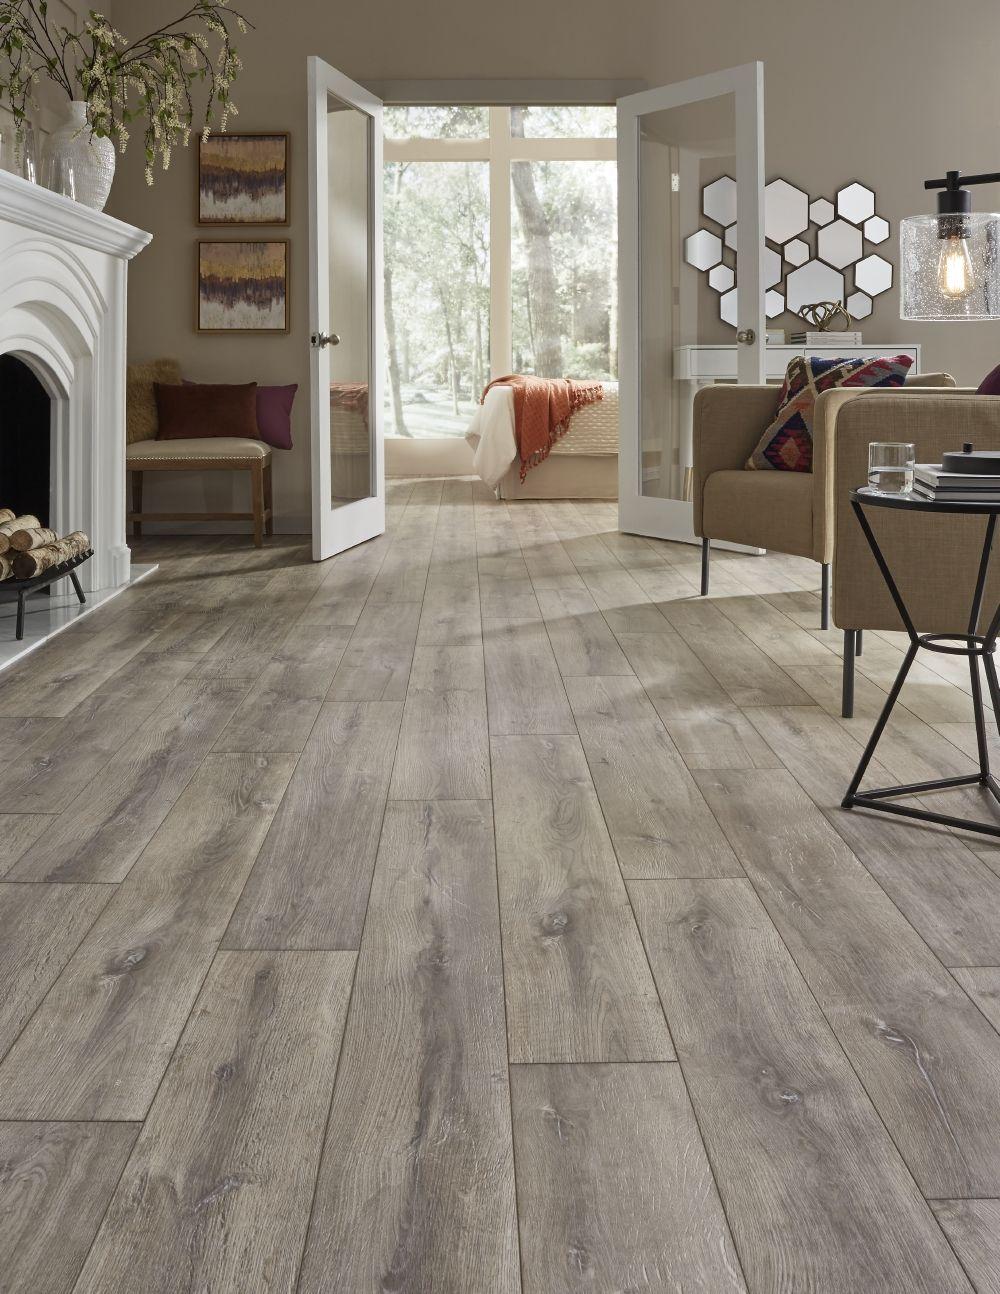 A european white oak look that evokes images of gently for European laminate flooring